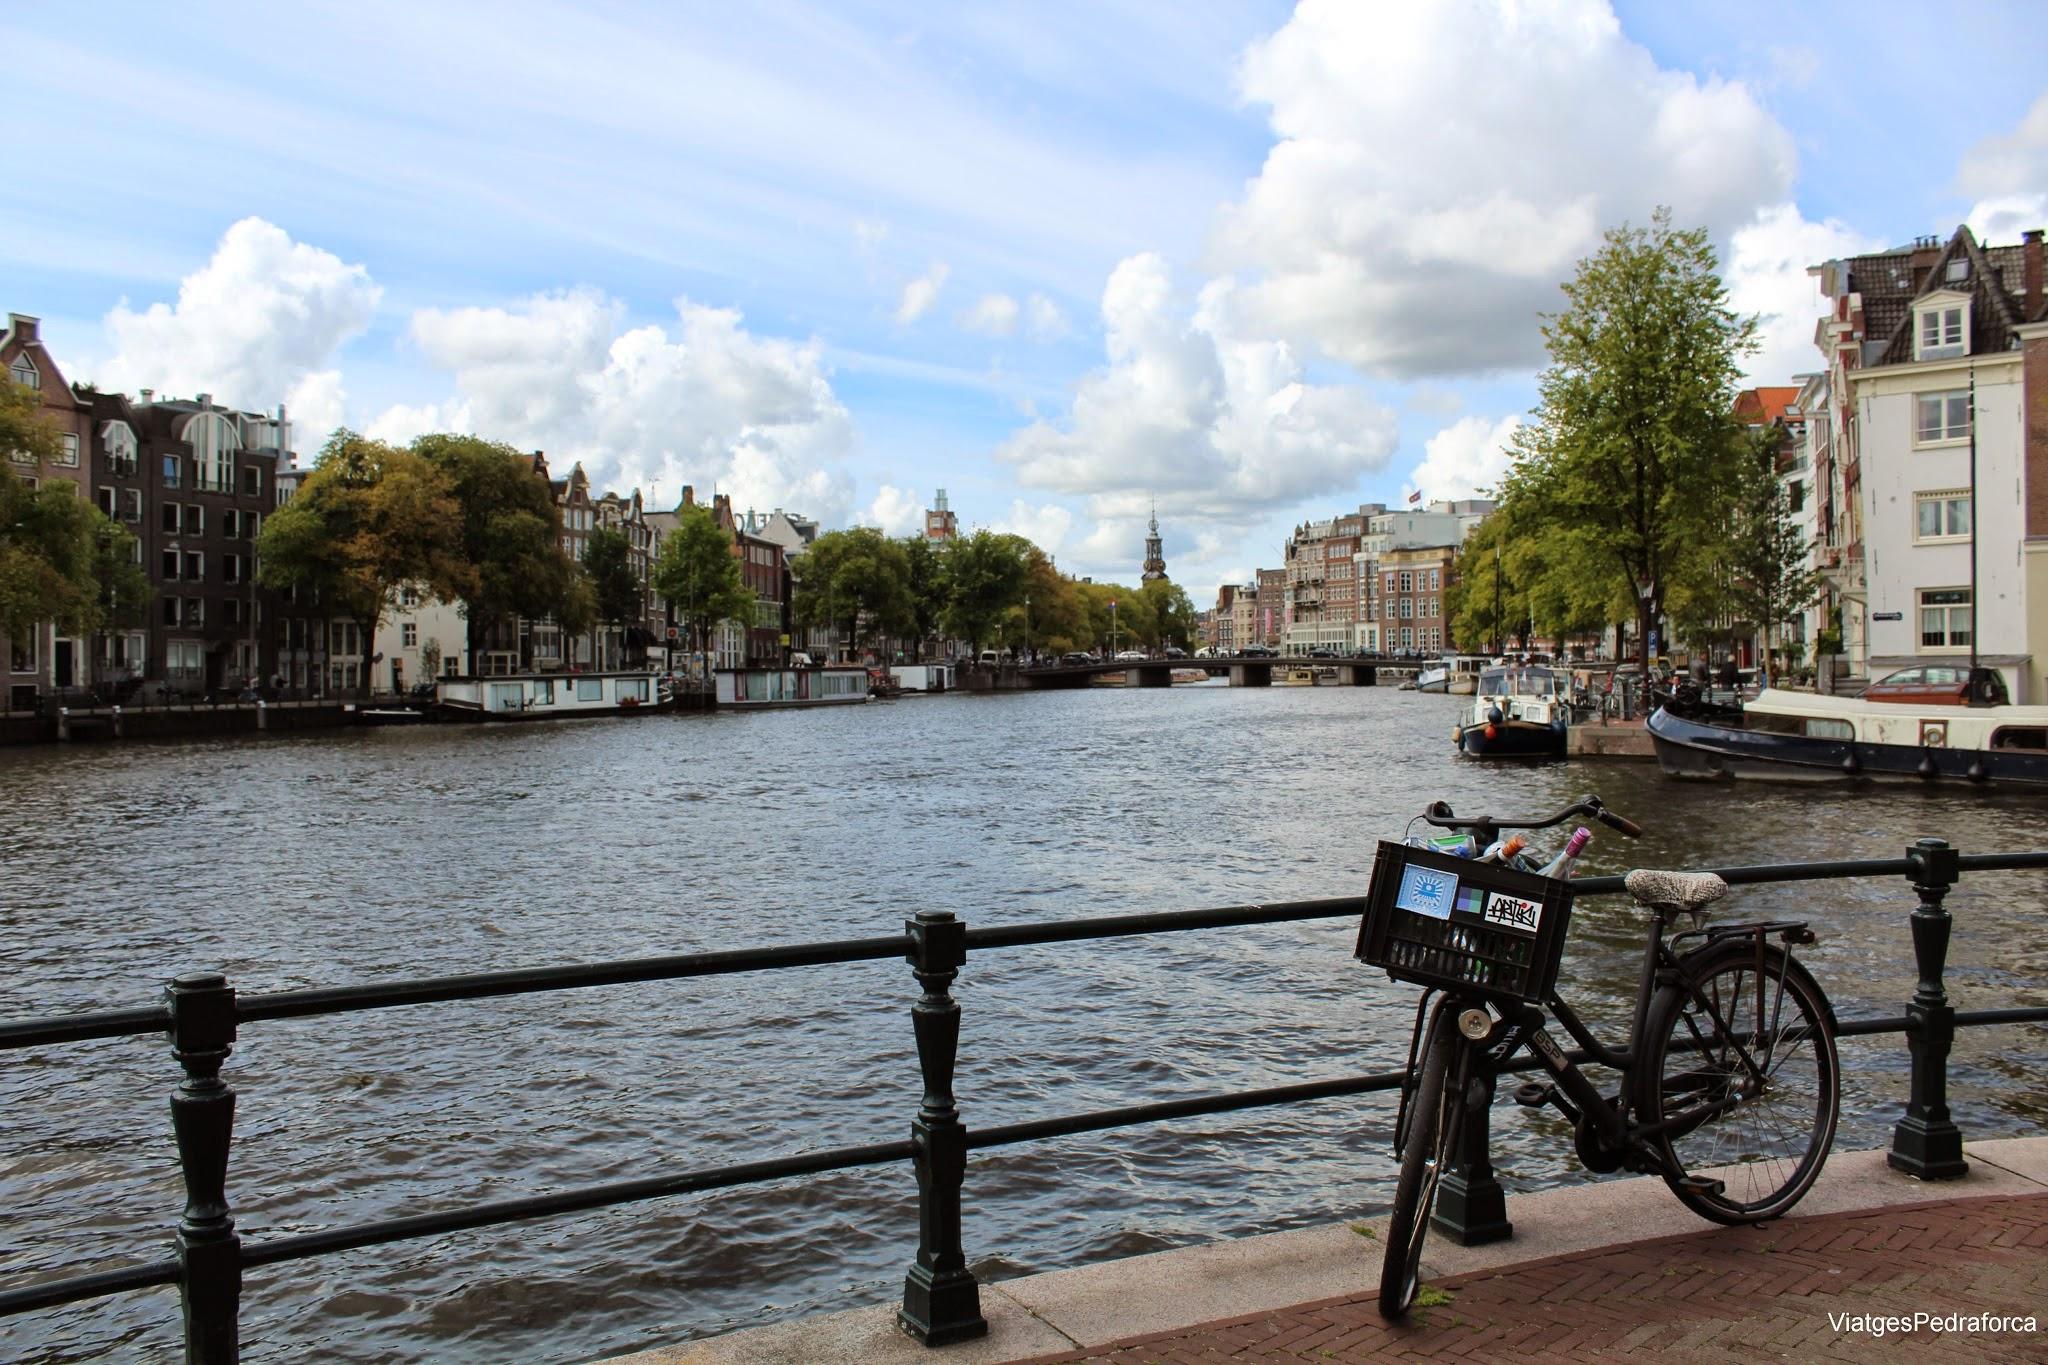 Amsterdam bicicleta canal Holanda Països Baixos